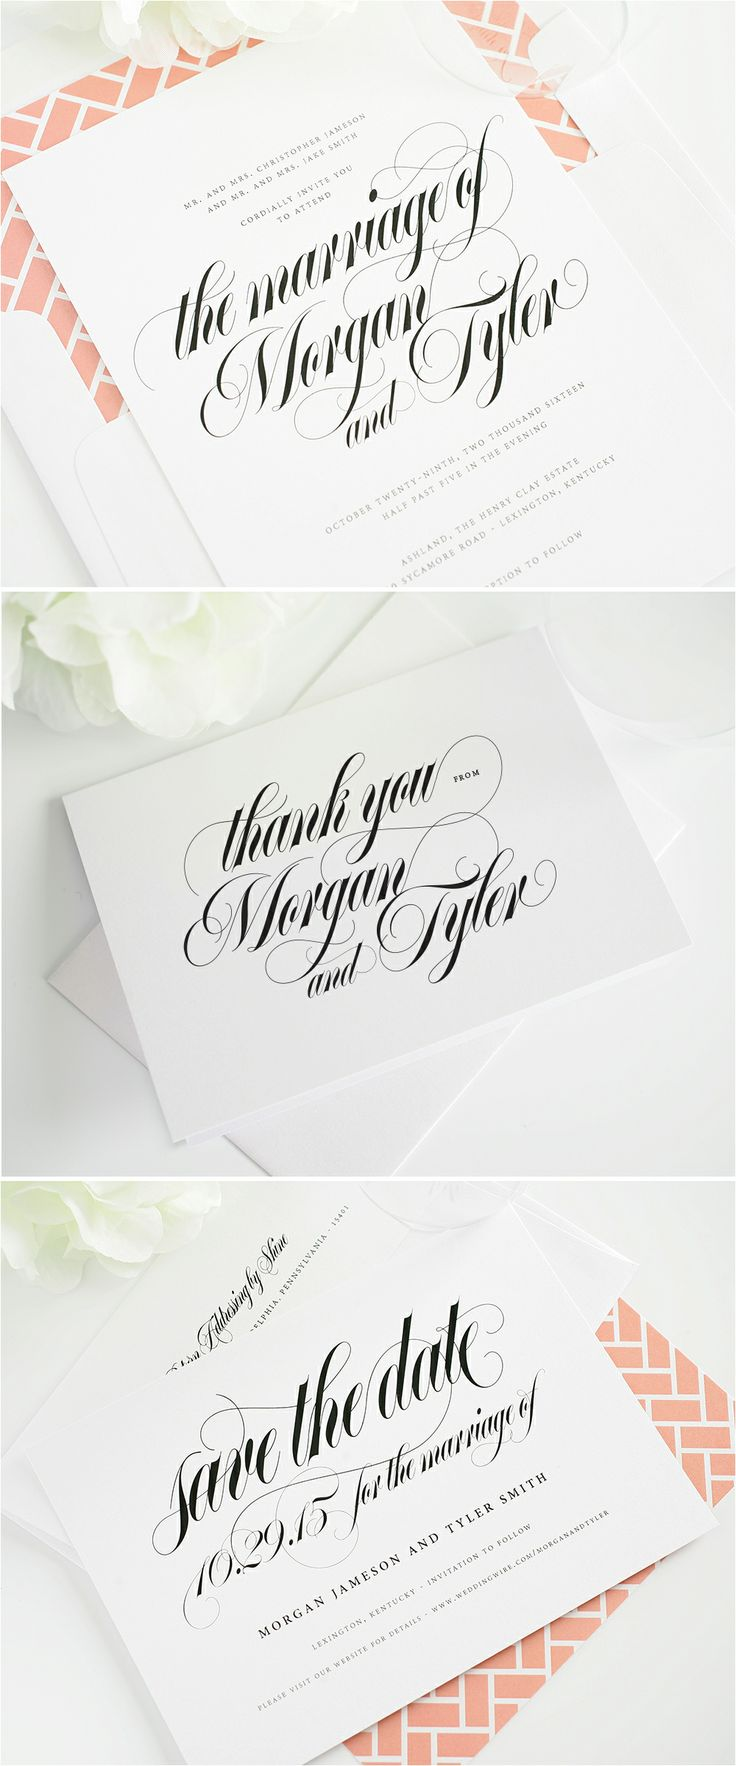 http://www.shineweddinginvitations.com/wedding-invitations/calligraphy-names-wedding-invitations